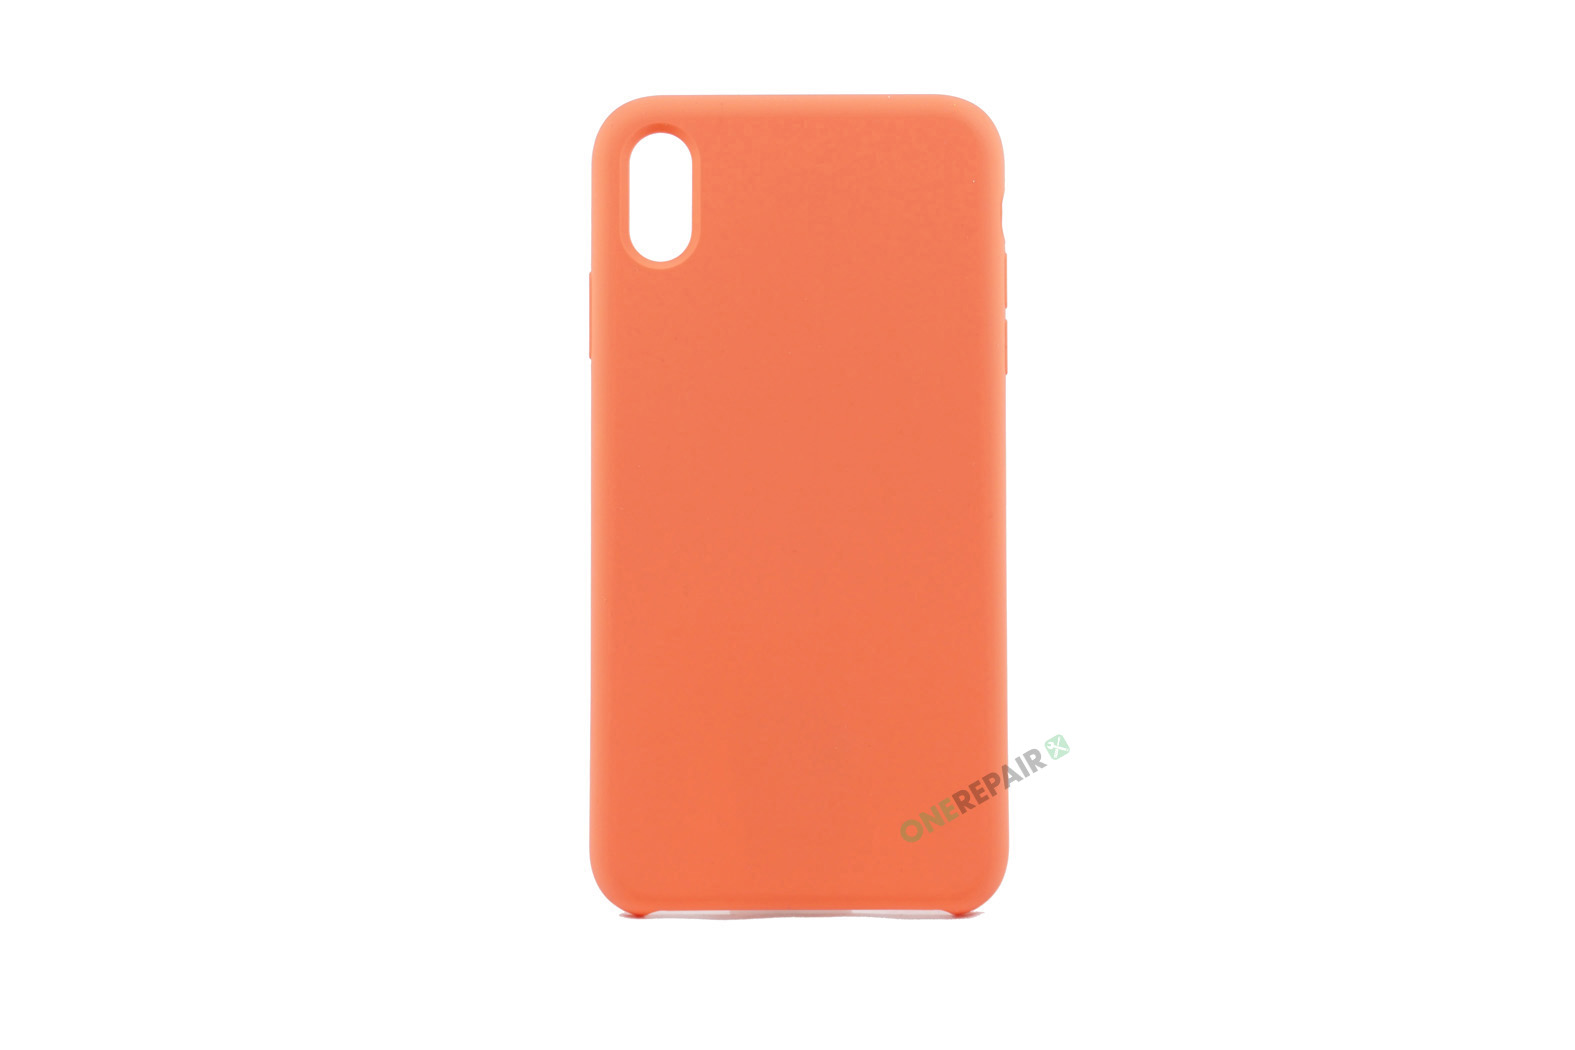 iPhone, X Xs Max, Silikone, Silikonecover, Mobilcover, Mobil cover, billig, Orange